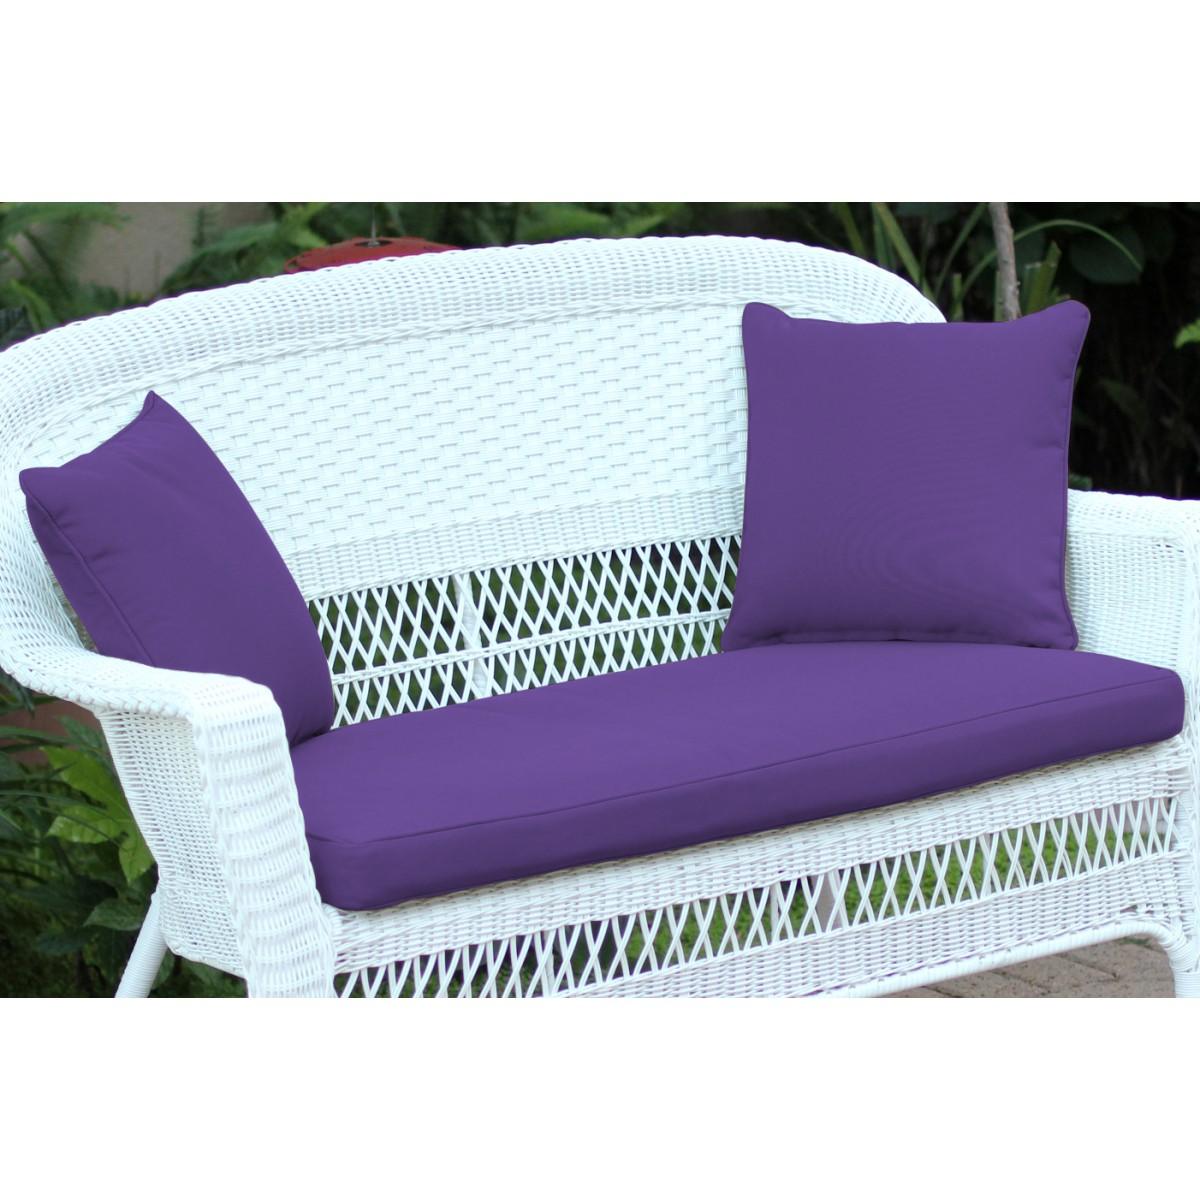 Miraculous Purple Loveseat Cushion With Pillows Lamtechconsult Wood Chair Design Ideas Lamtechconsultcom